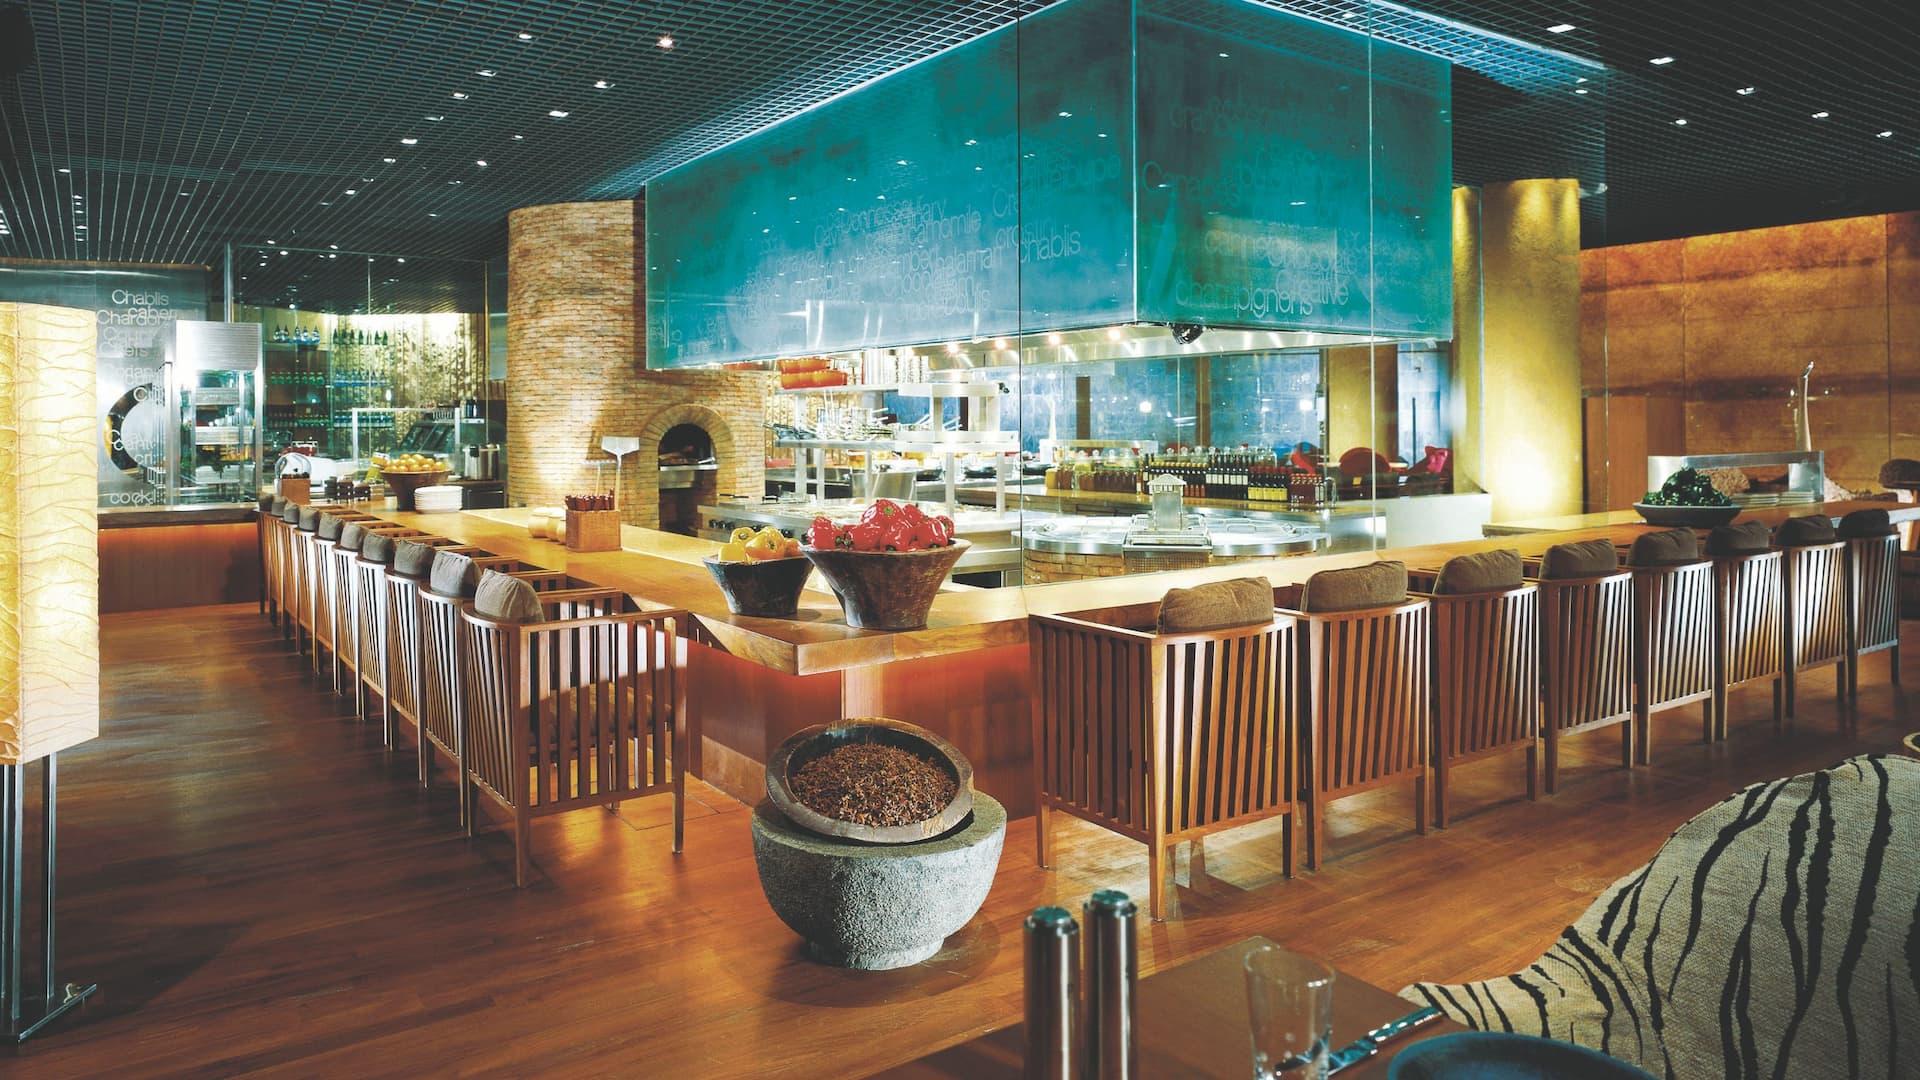 C's Steak and Seafood Restaurant at Grand Hyatt Jakarta